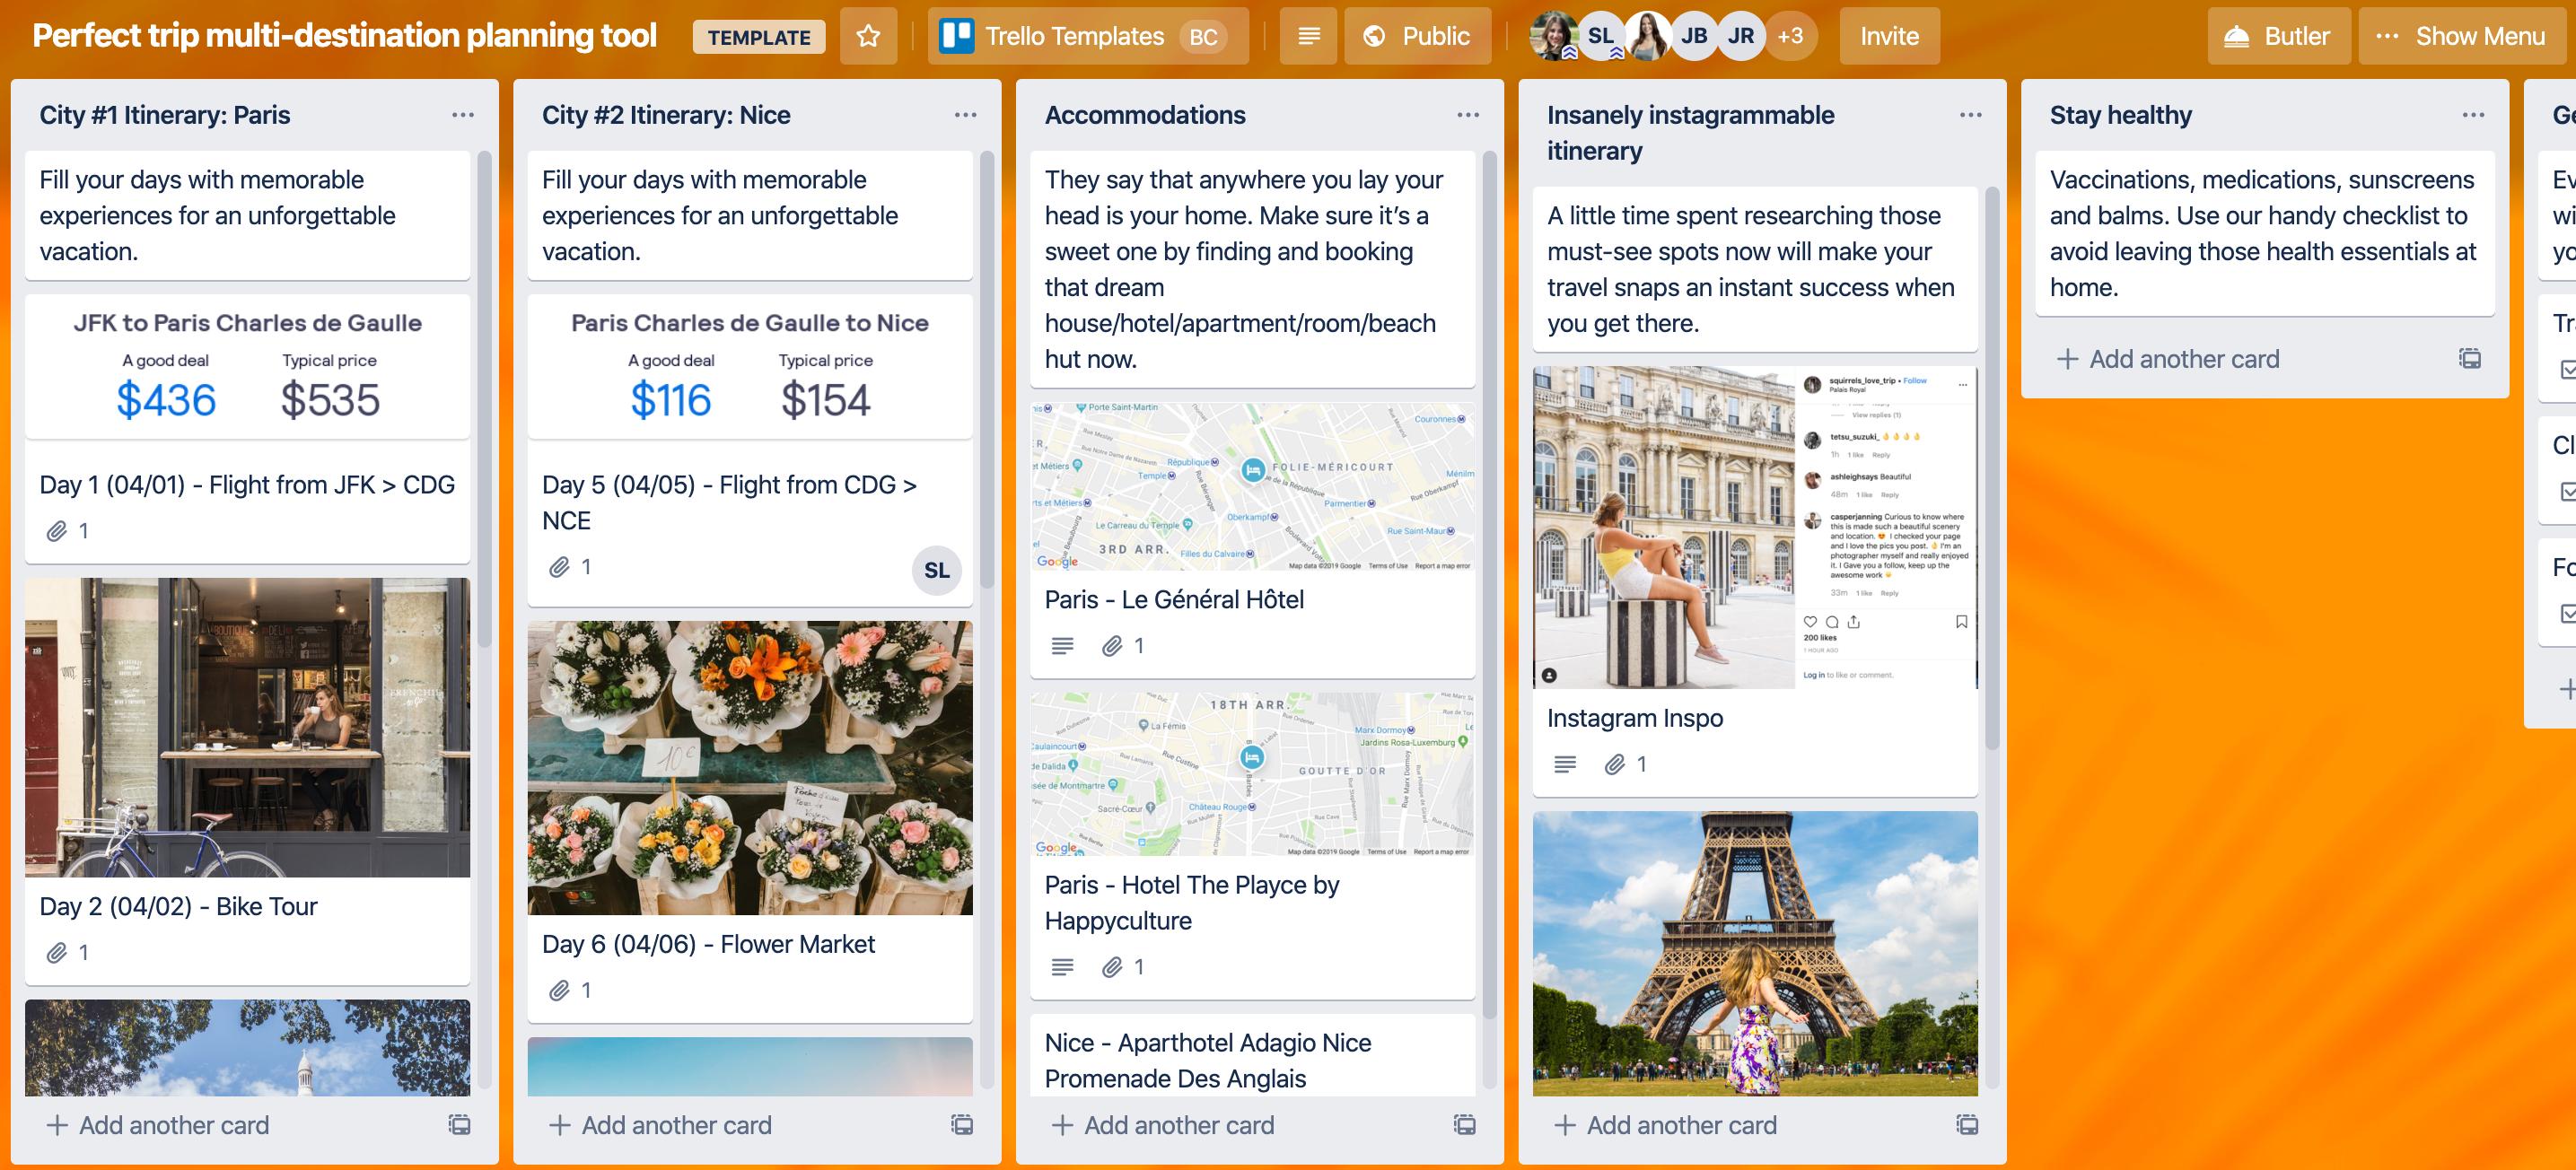 Skyscanner - multi-destination planning planning tool